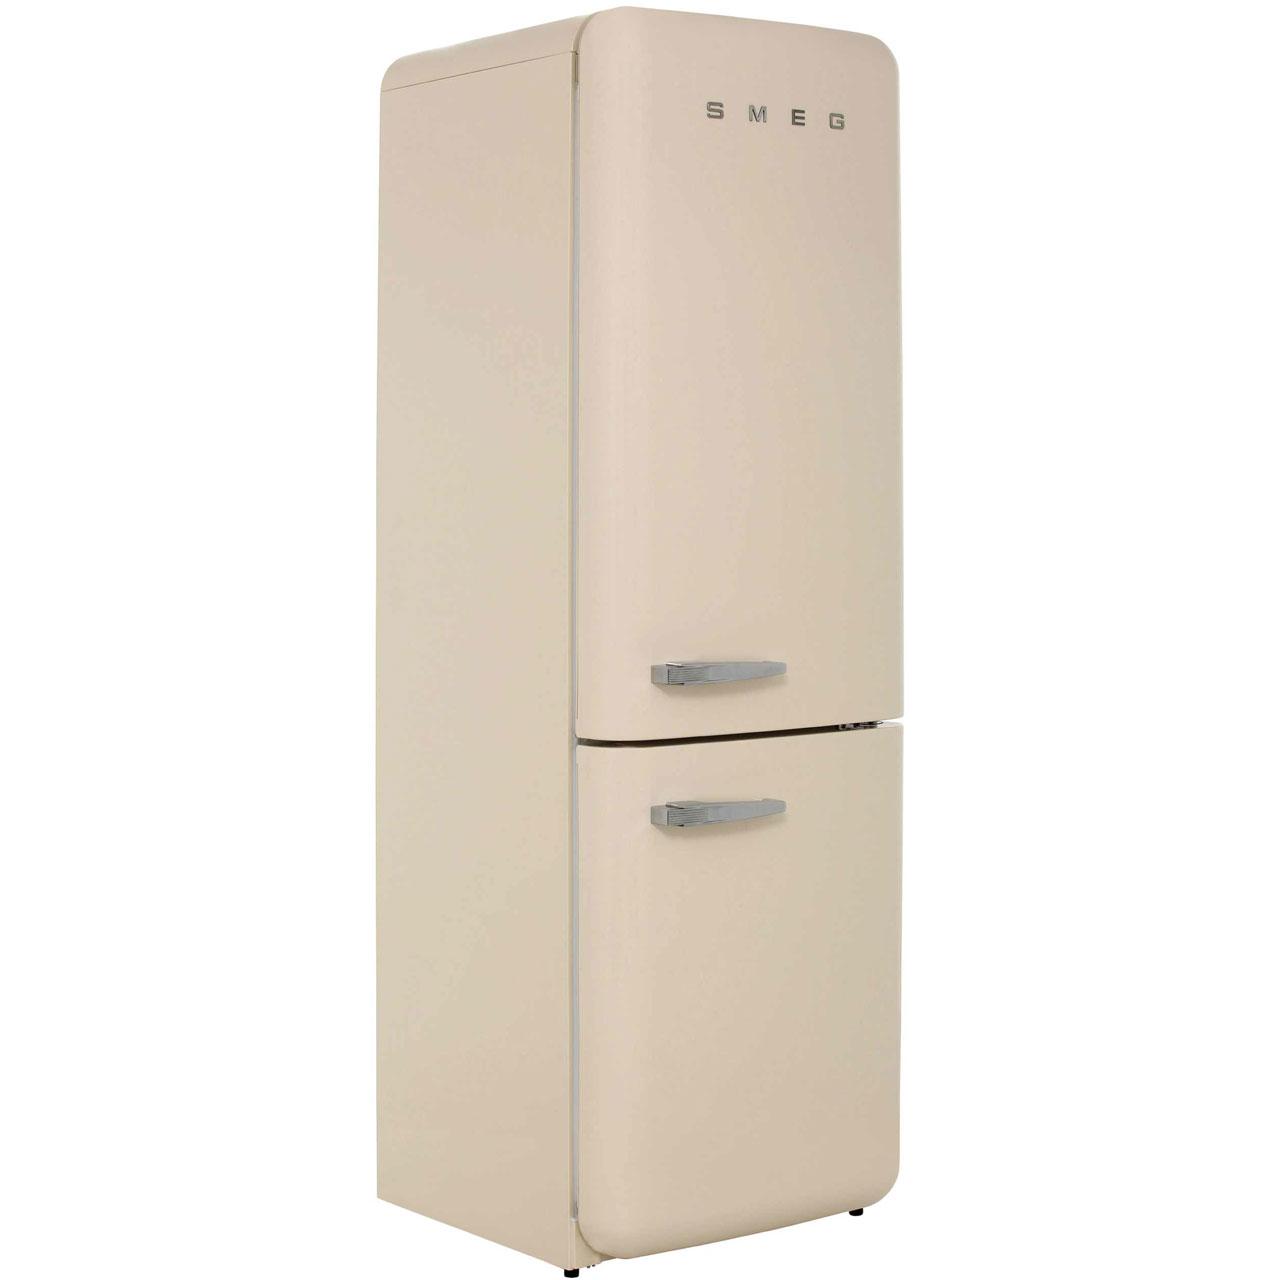 Smeg fridge freezer fab32rnc - Smeg productos ...